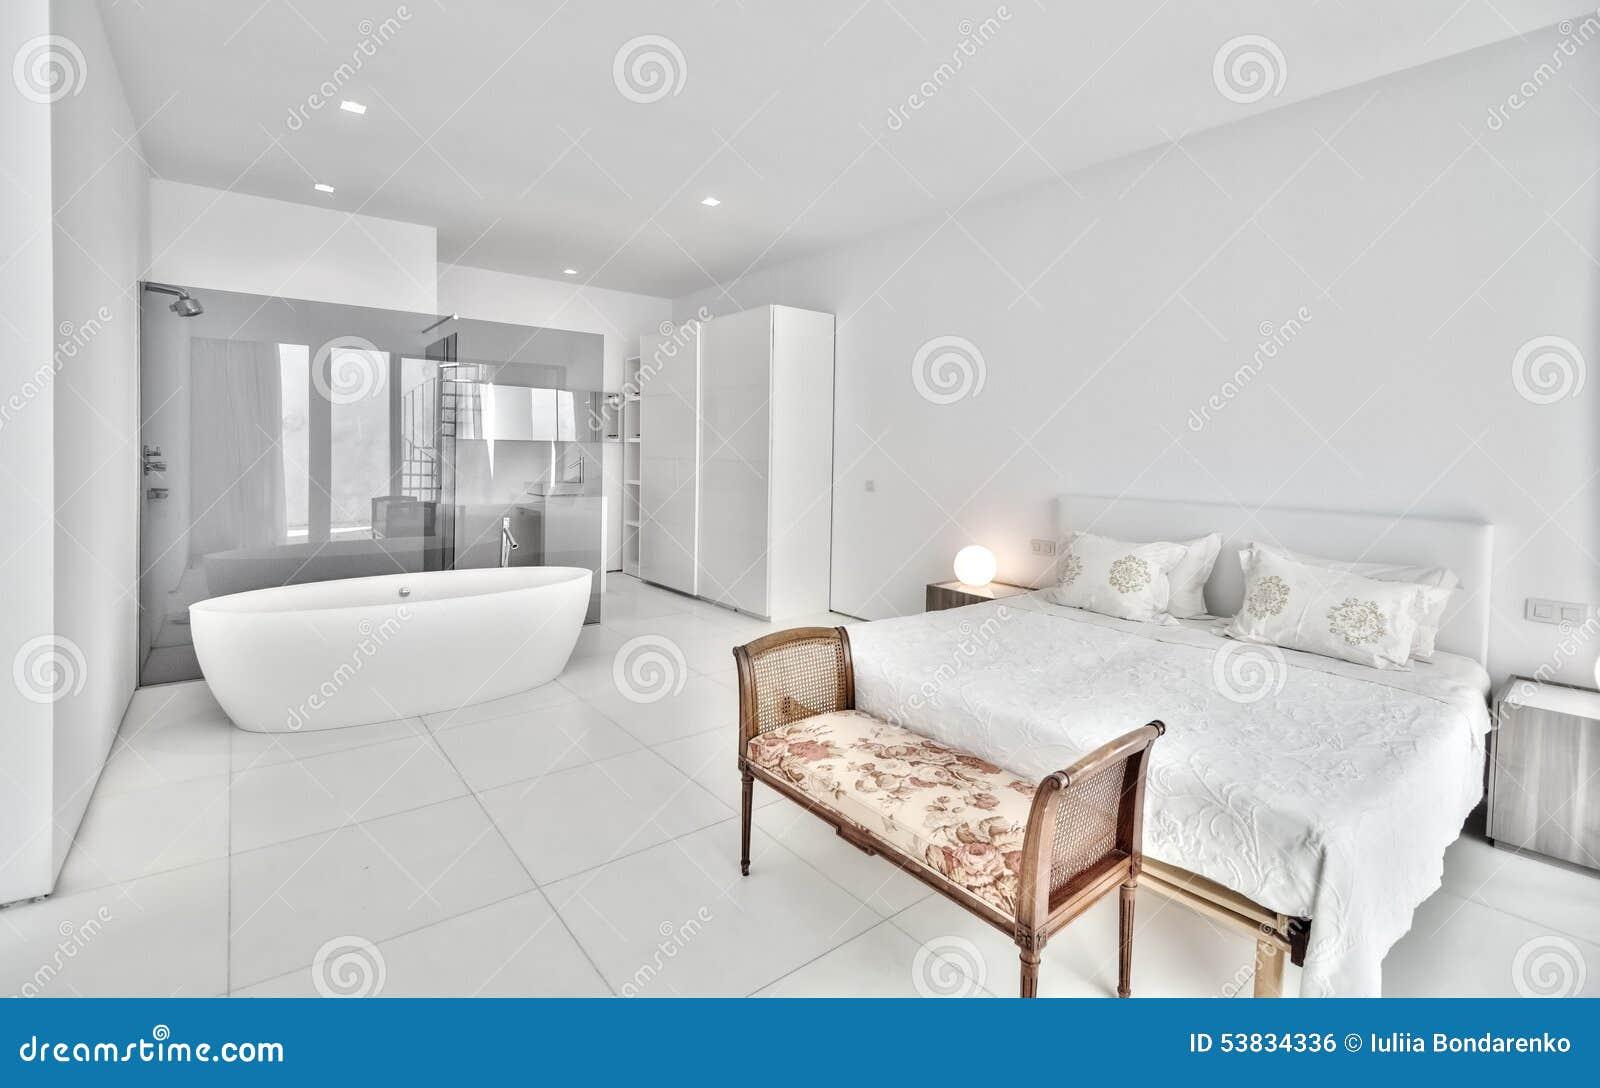 De Witte Slaapkamer : Witte slaapkamer in de moderne villa stock foto afbeelding